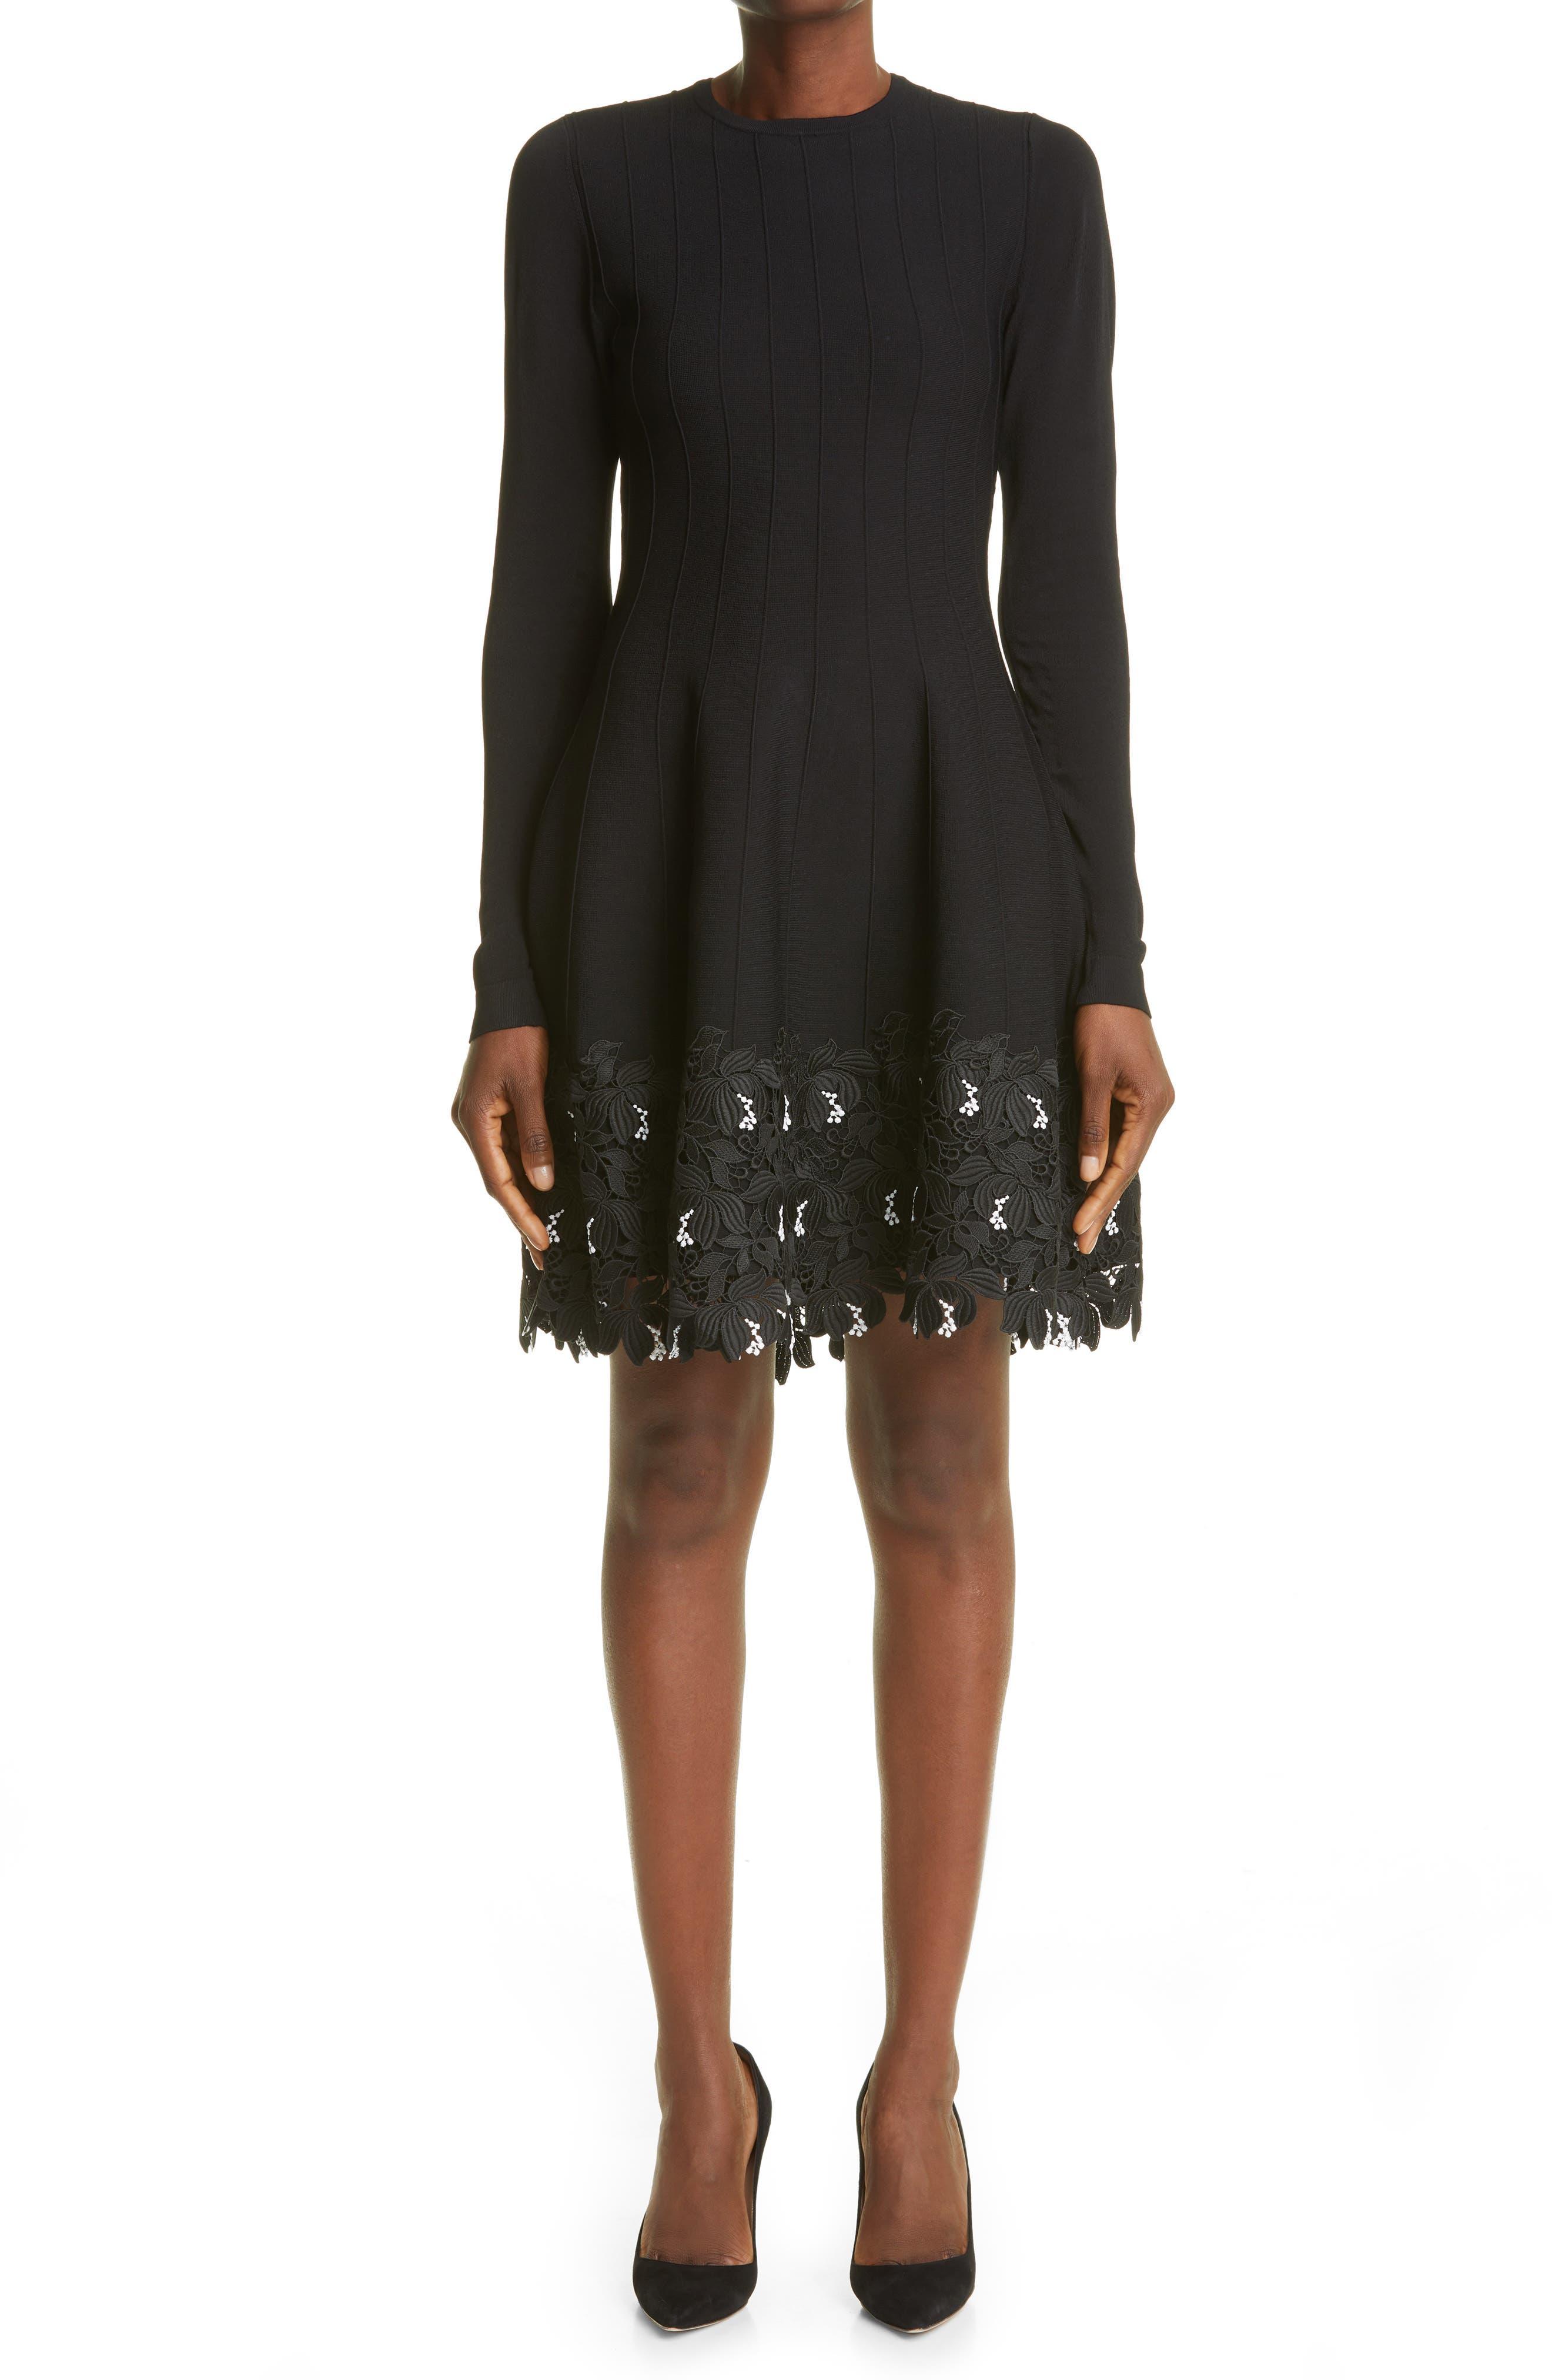 Lace Trim Long Sleeve Knit Dress